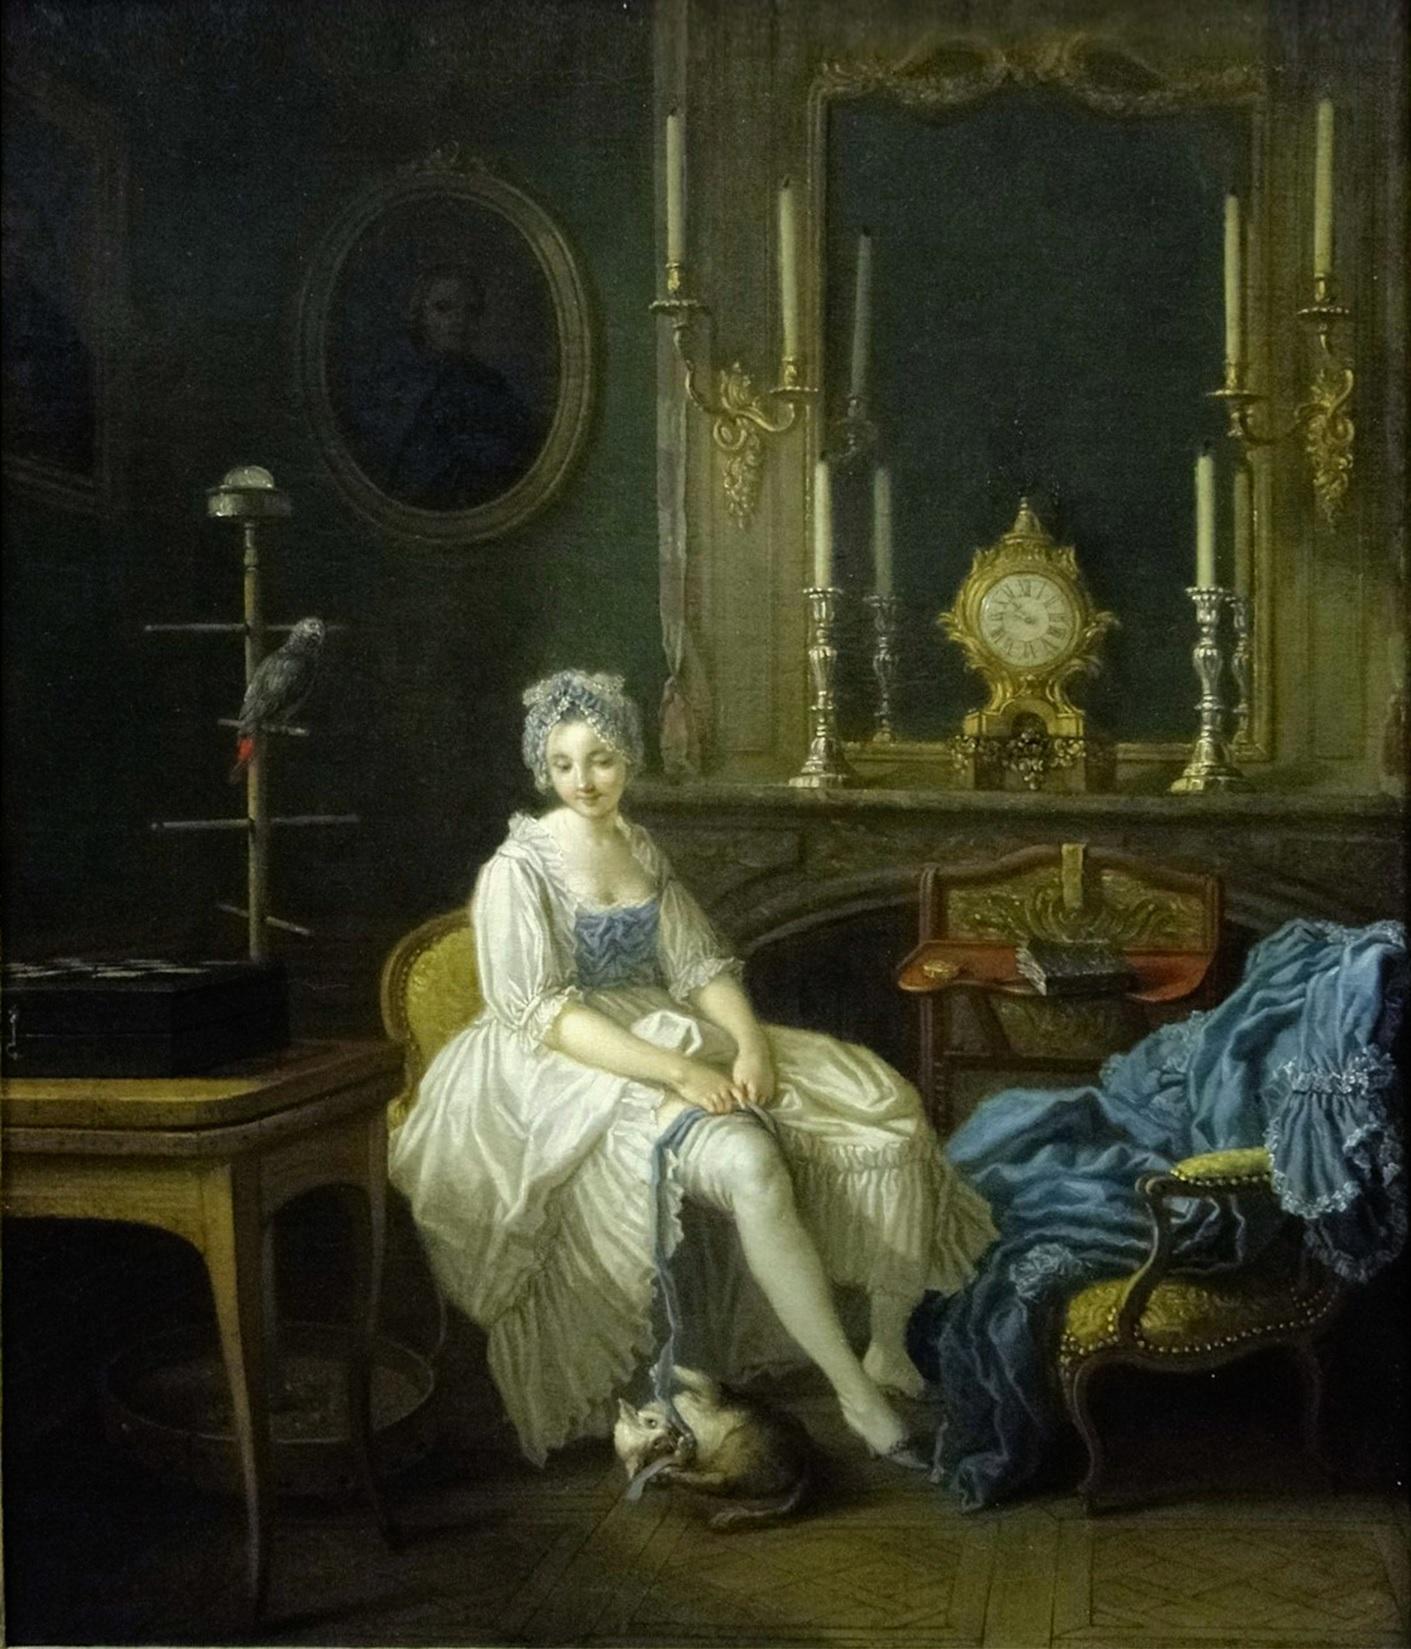 etienne-jeaurat-the-boudoir-1769-walker-art-gallery-liverpool-uk